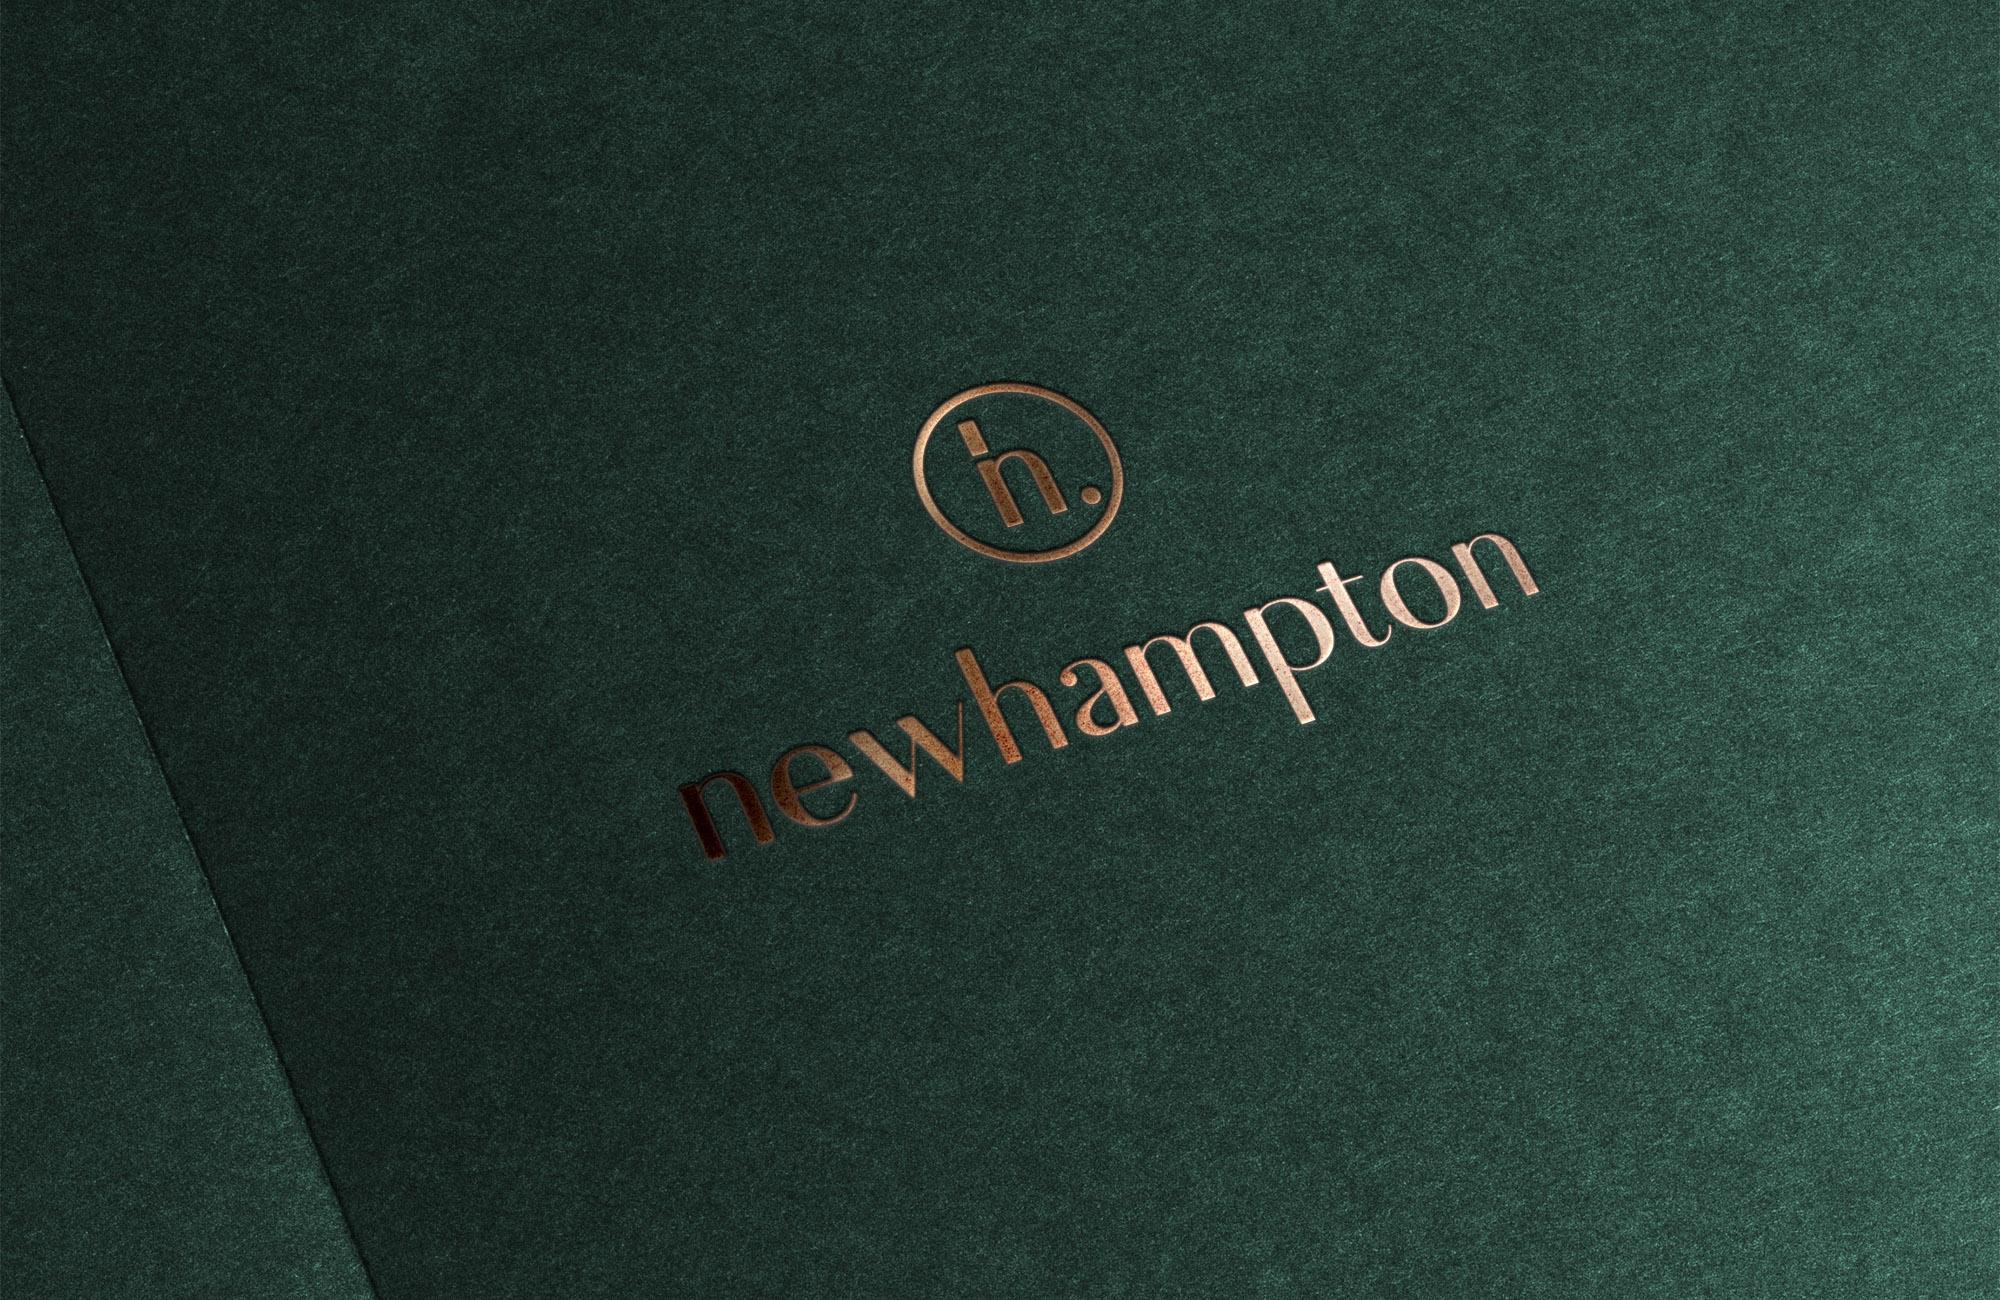 ALTR-newhampton-01